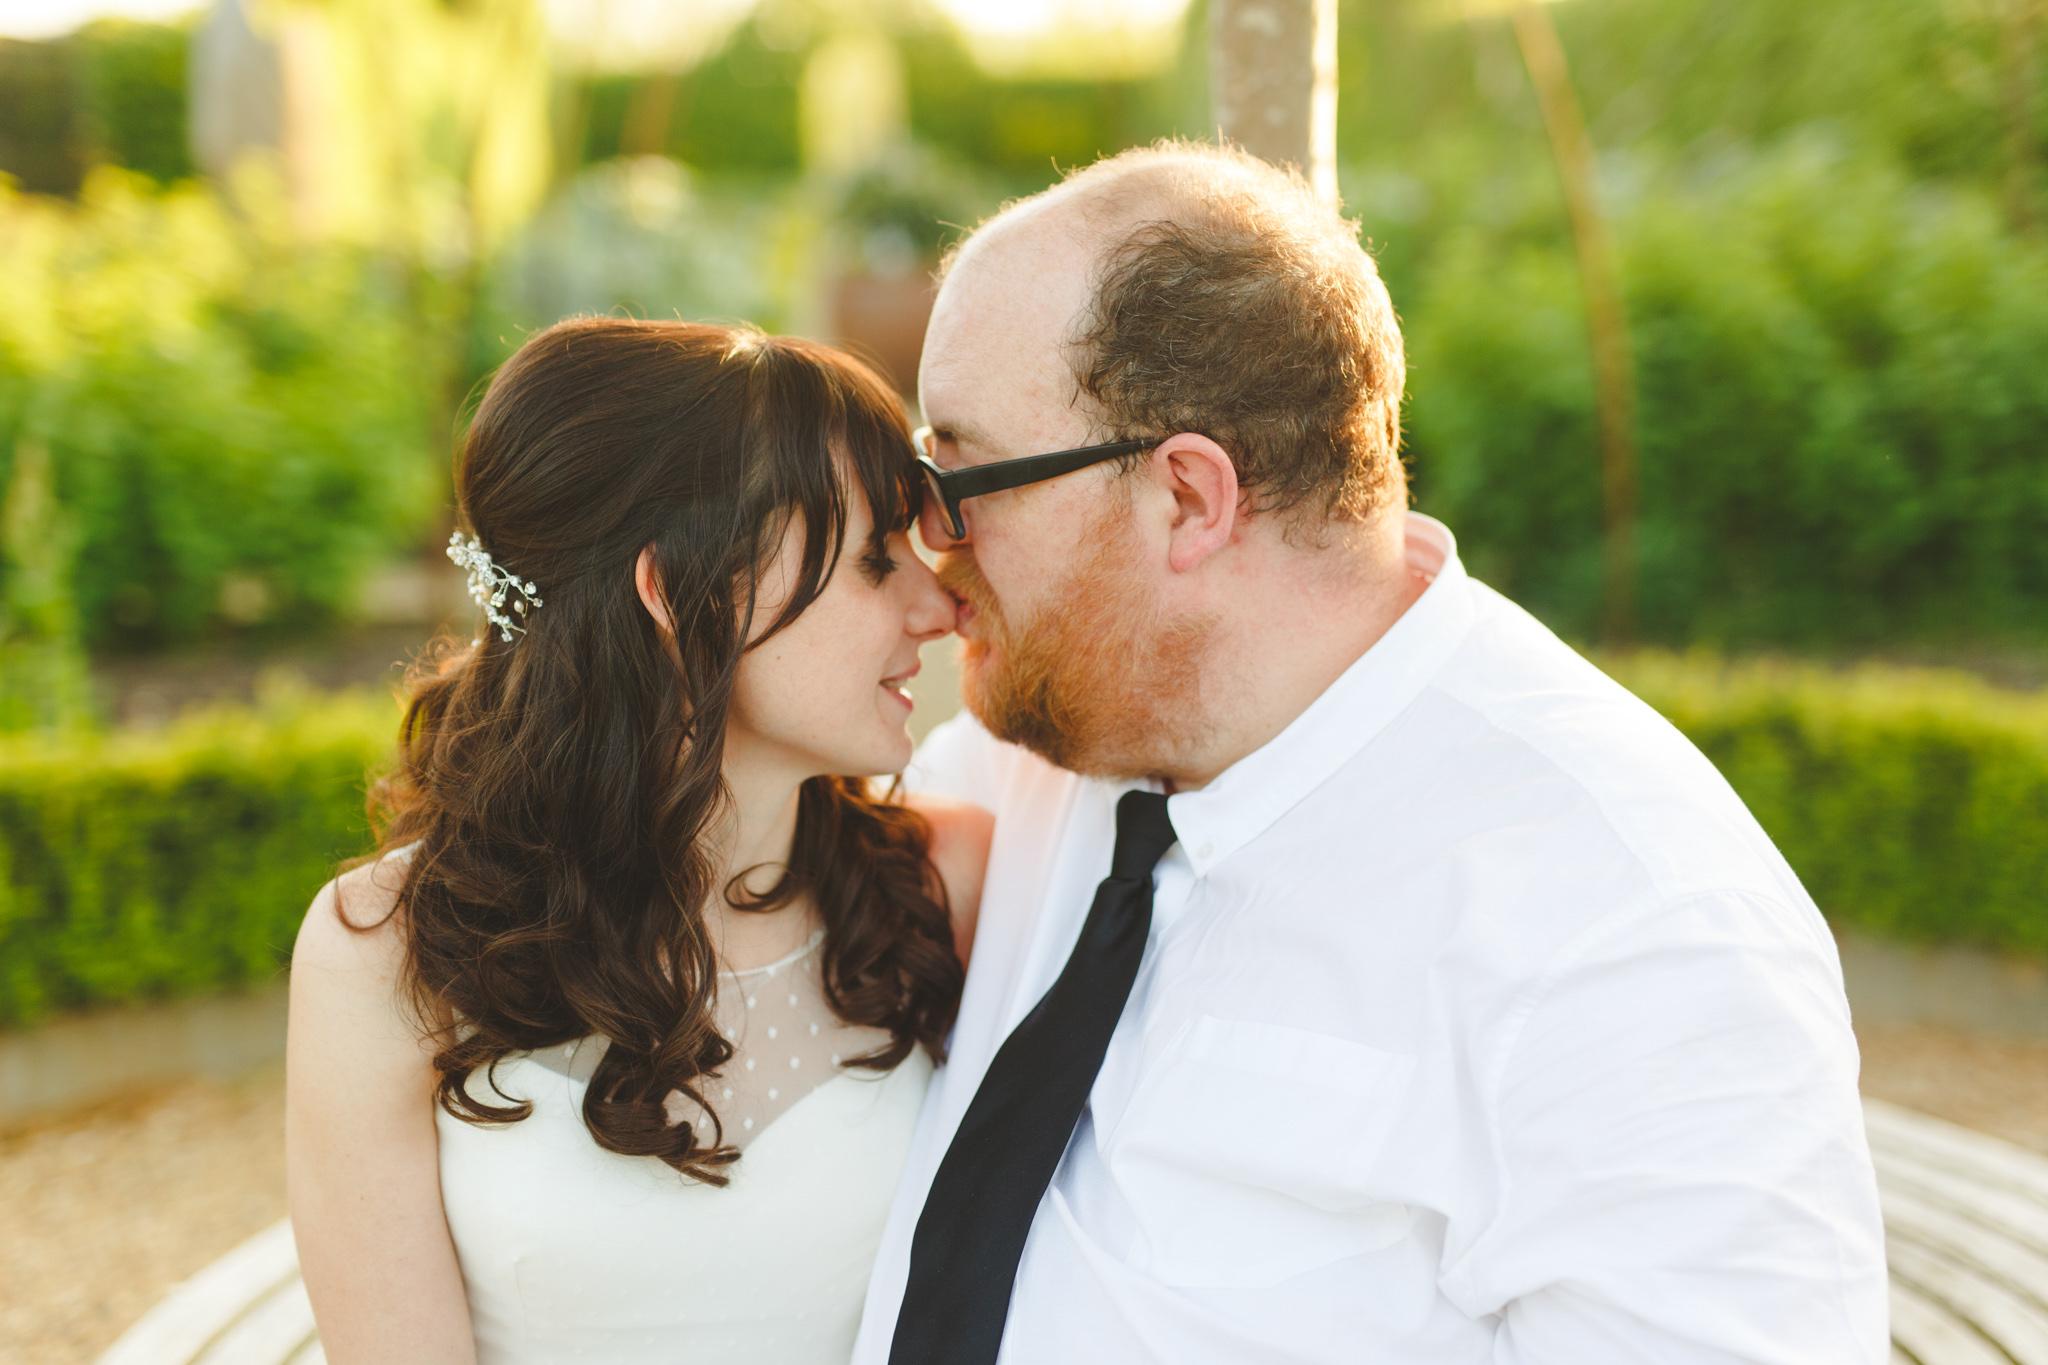 derbyshire-wedding-photographer-videographer-camera-hannah-52.jpg